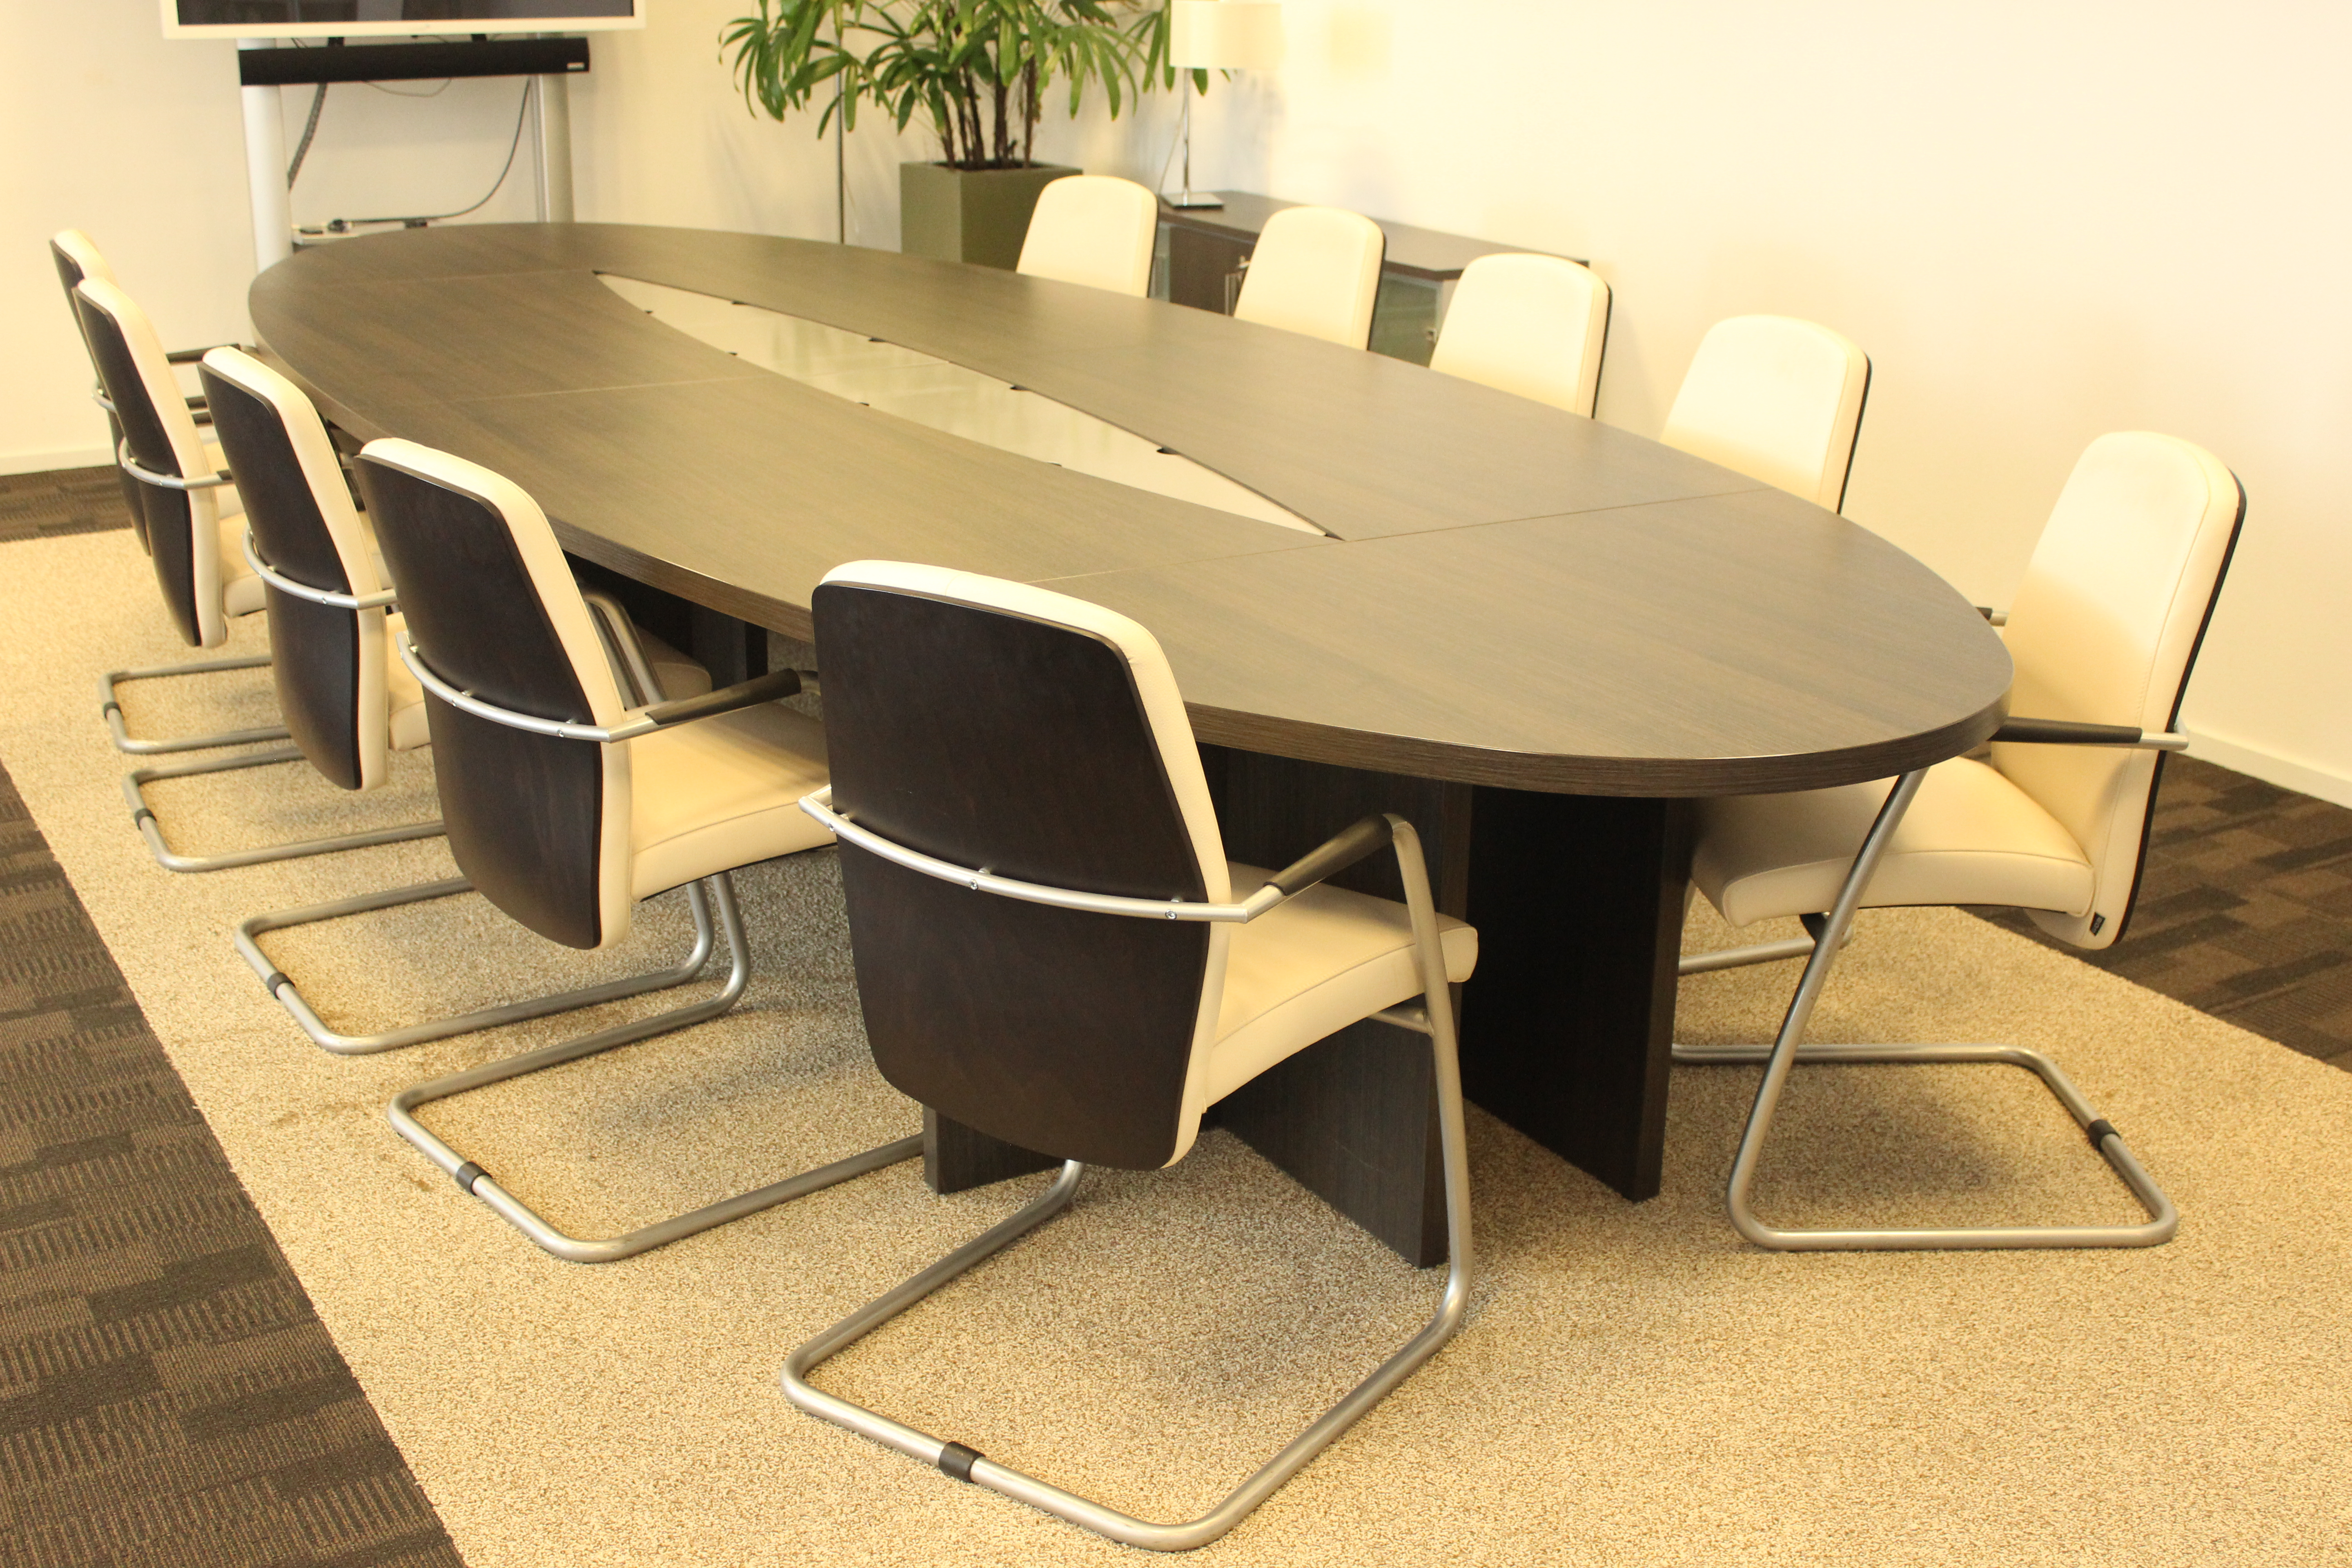 Conferentietafel (460 x 170) incl. bijpassende dressoirkast (100 x 70 x 41)